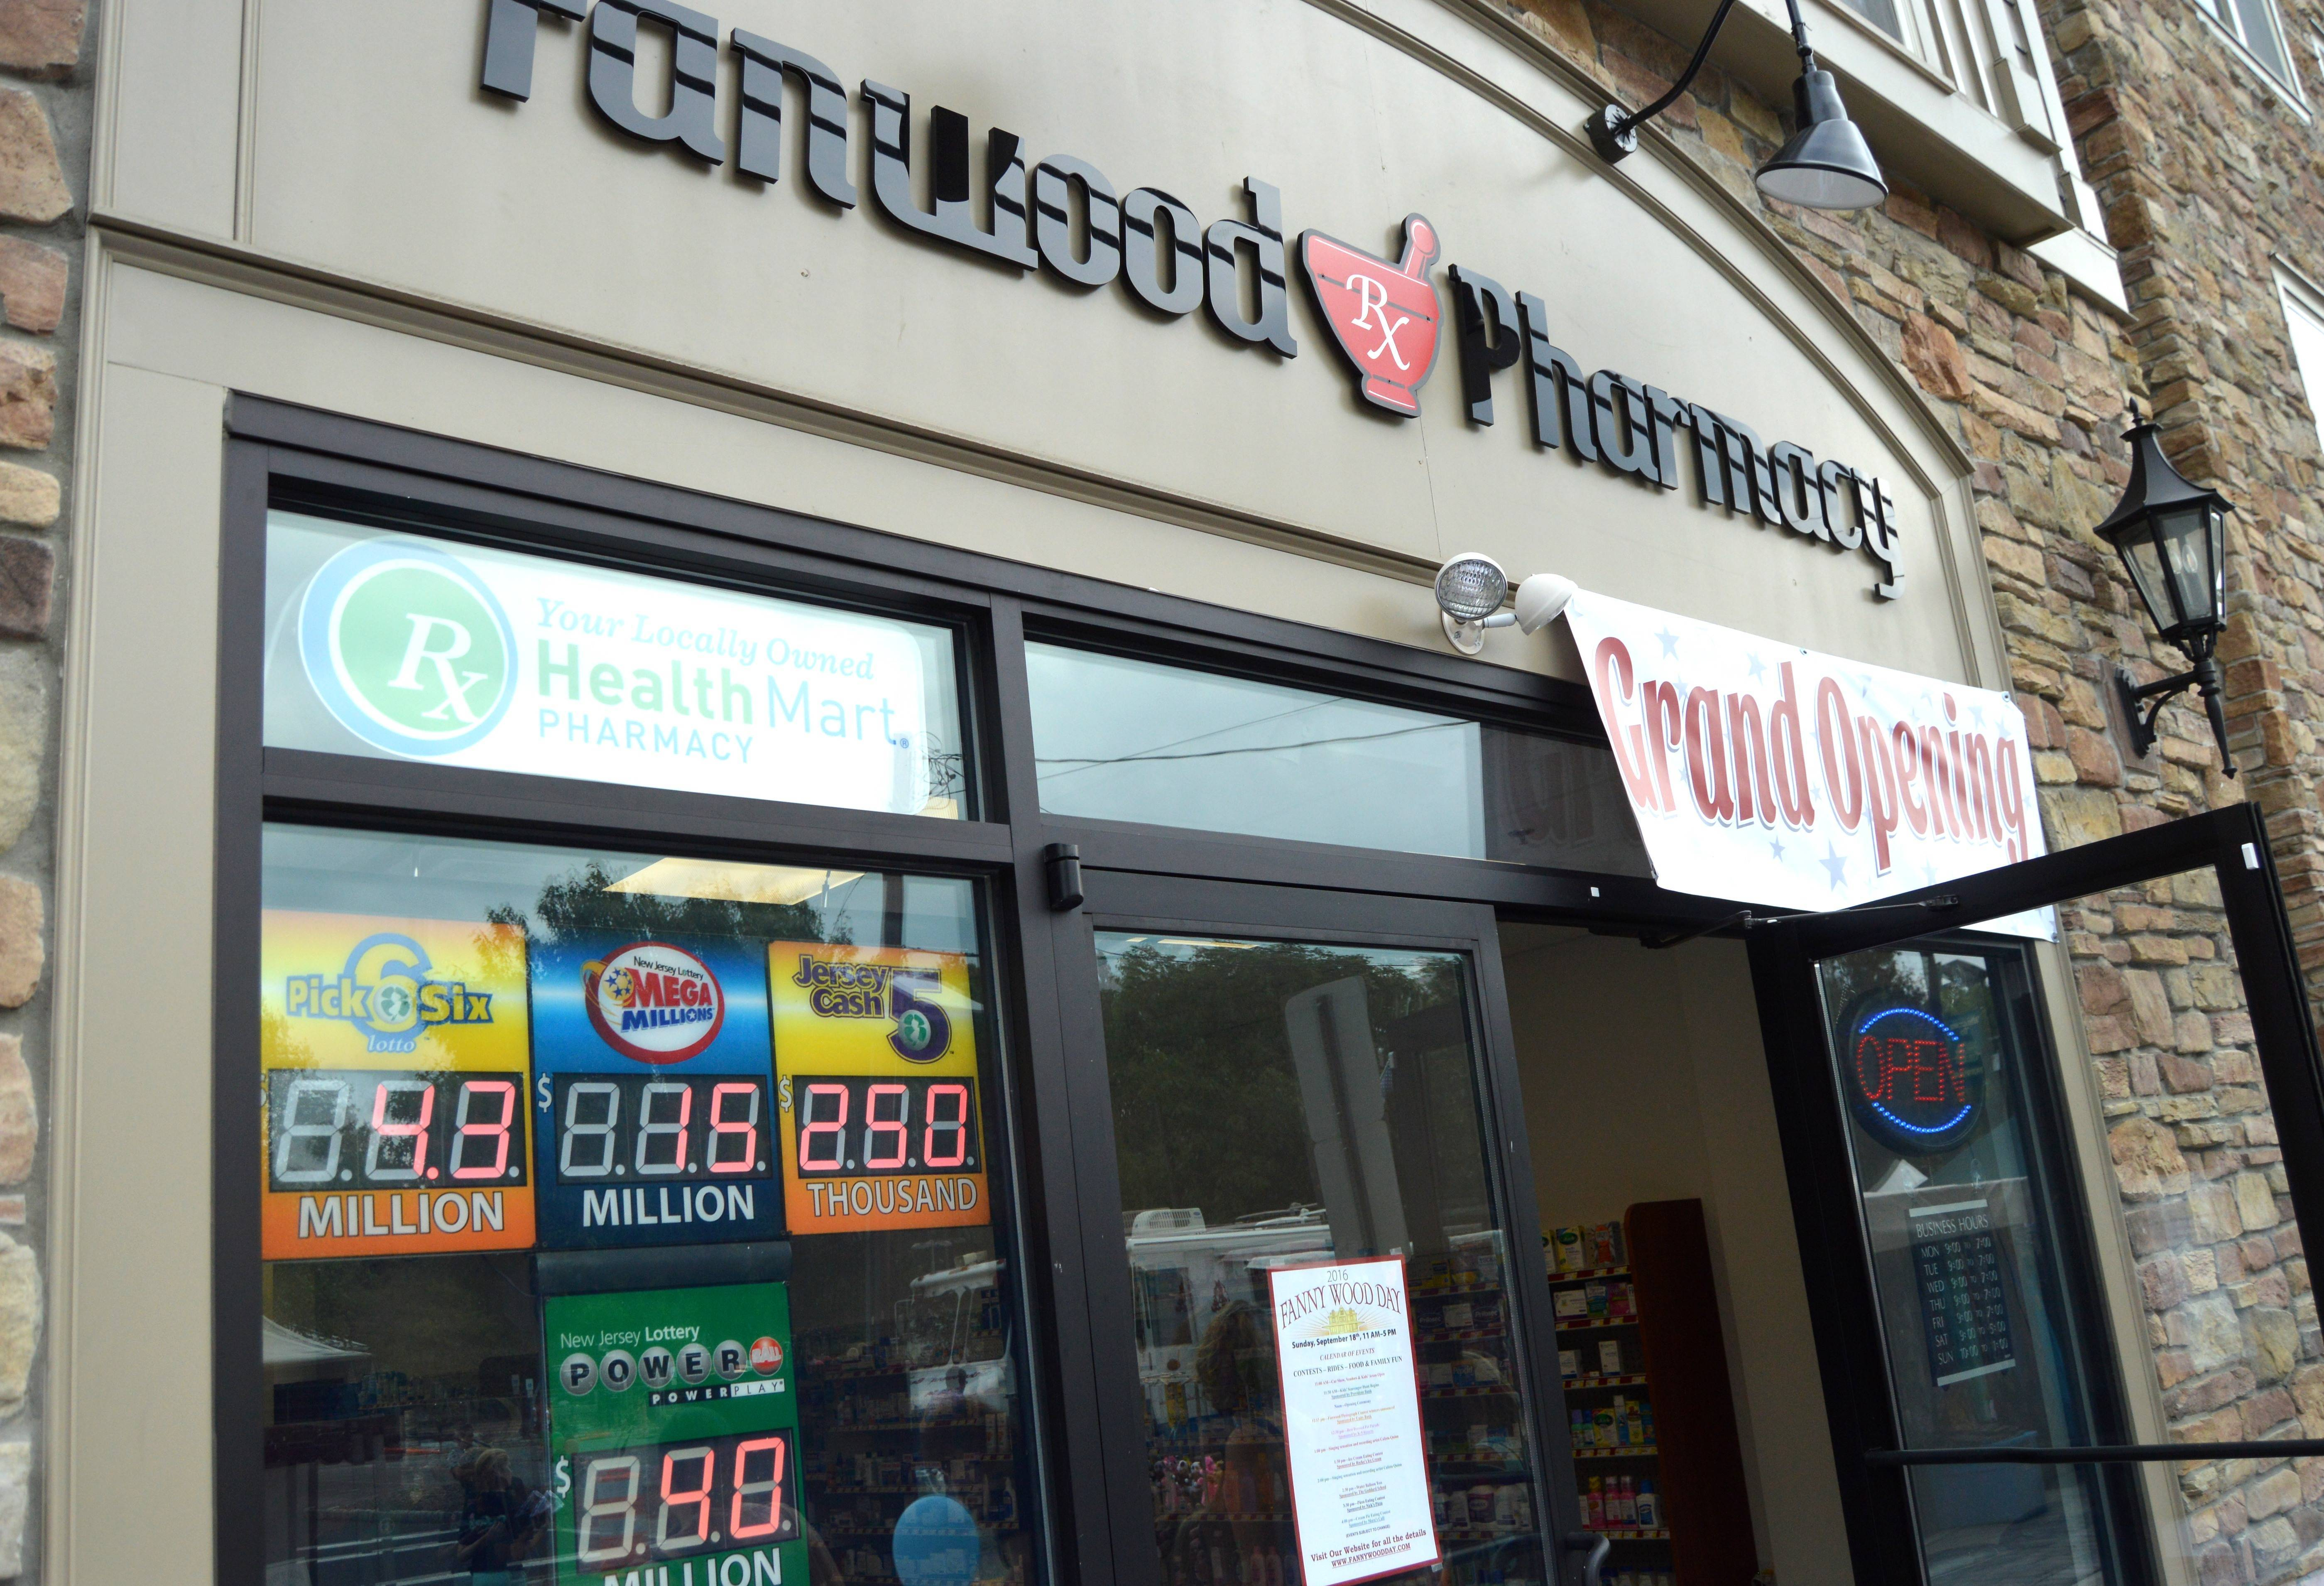 1f6ca726b26cc2b6e705_Fanwood_Pharmacy_-_outside.JPG